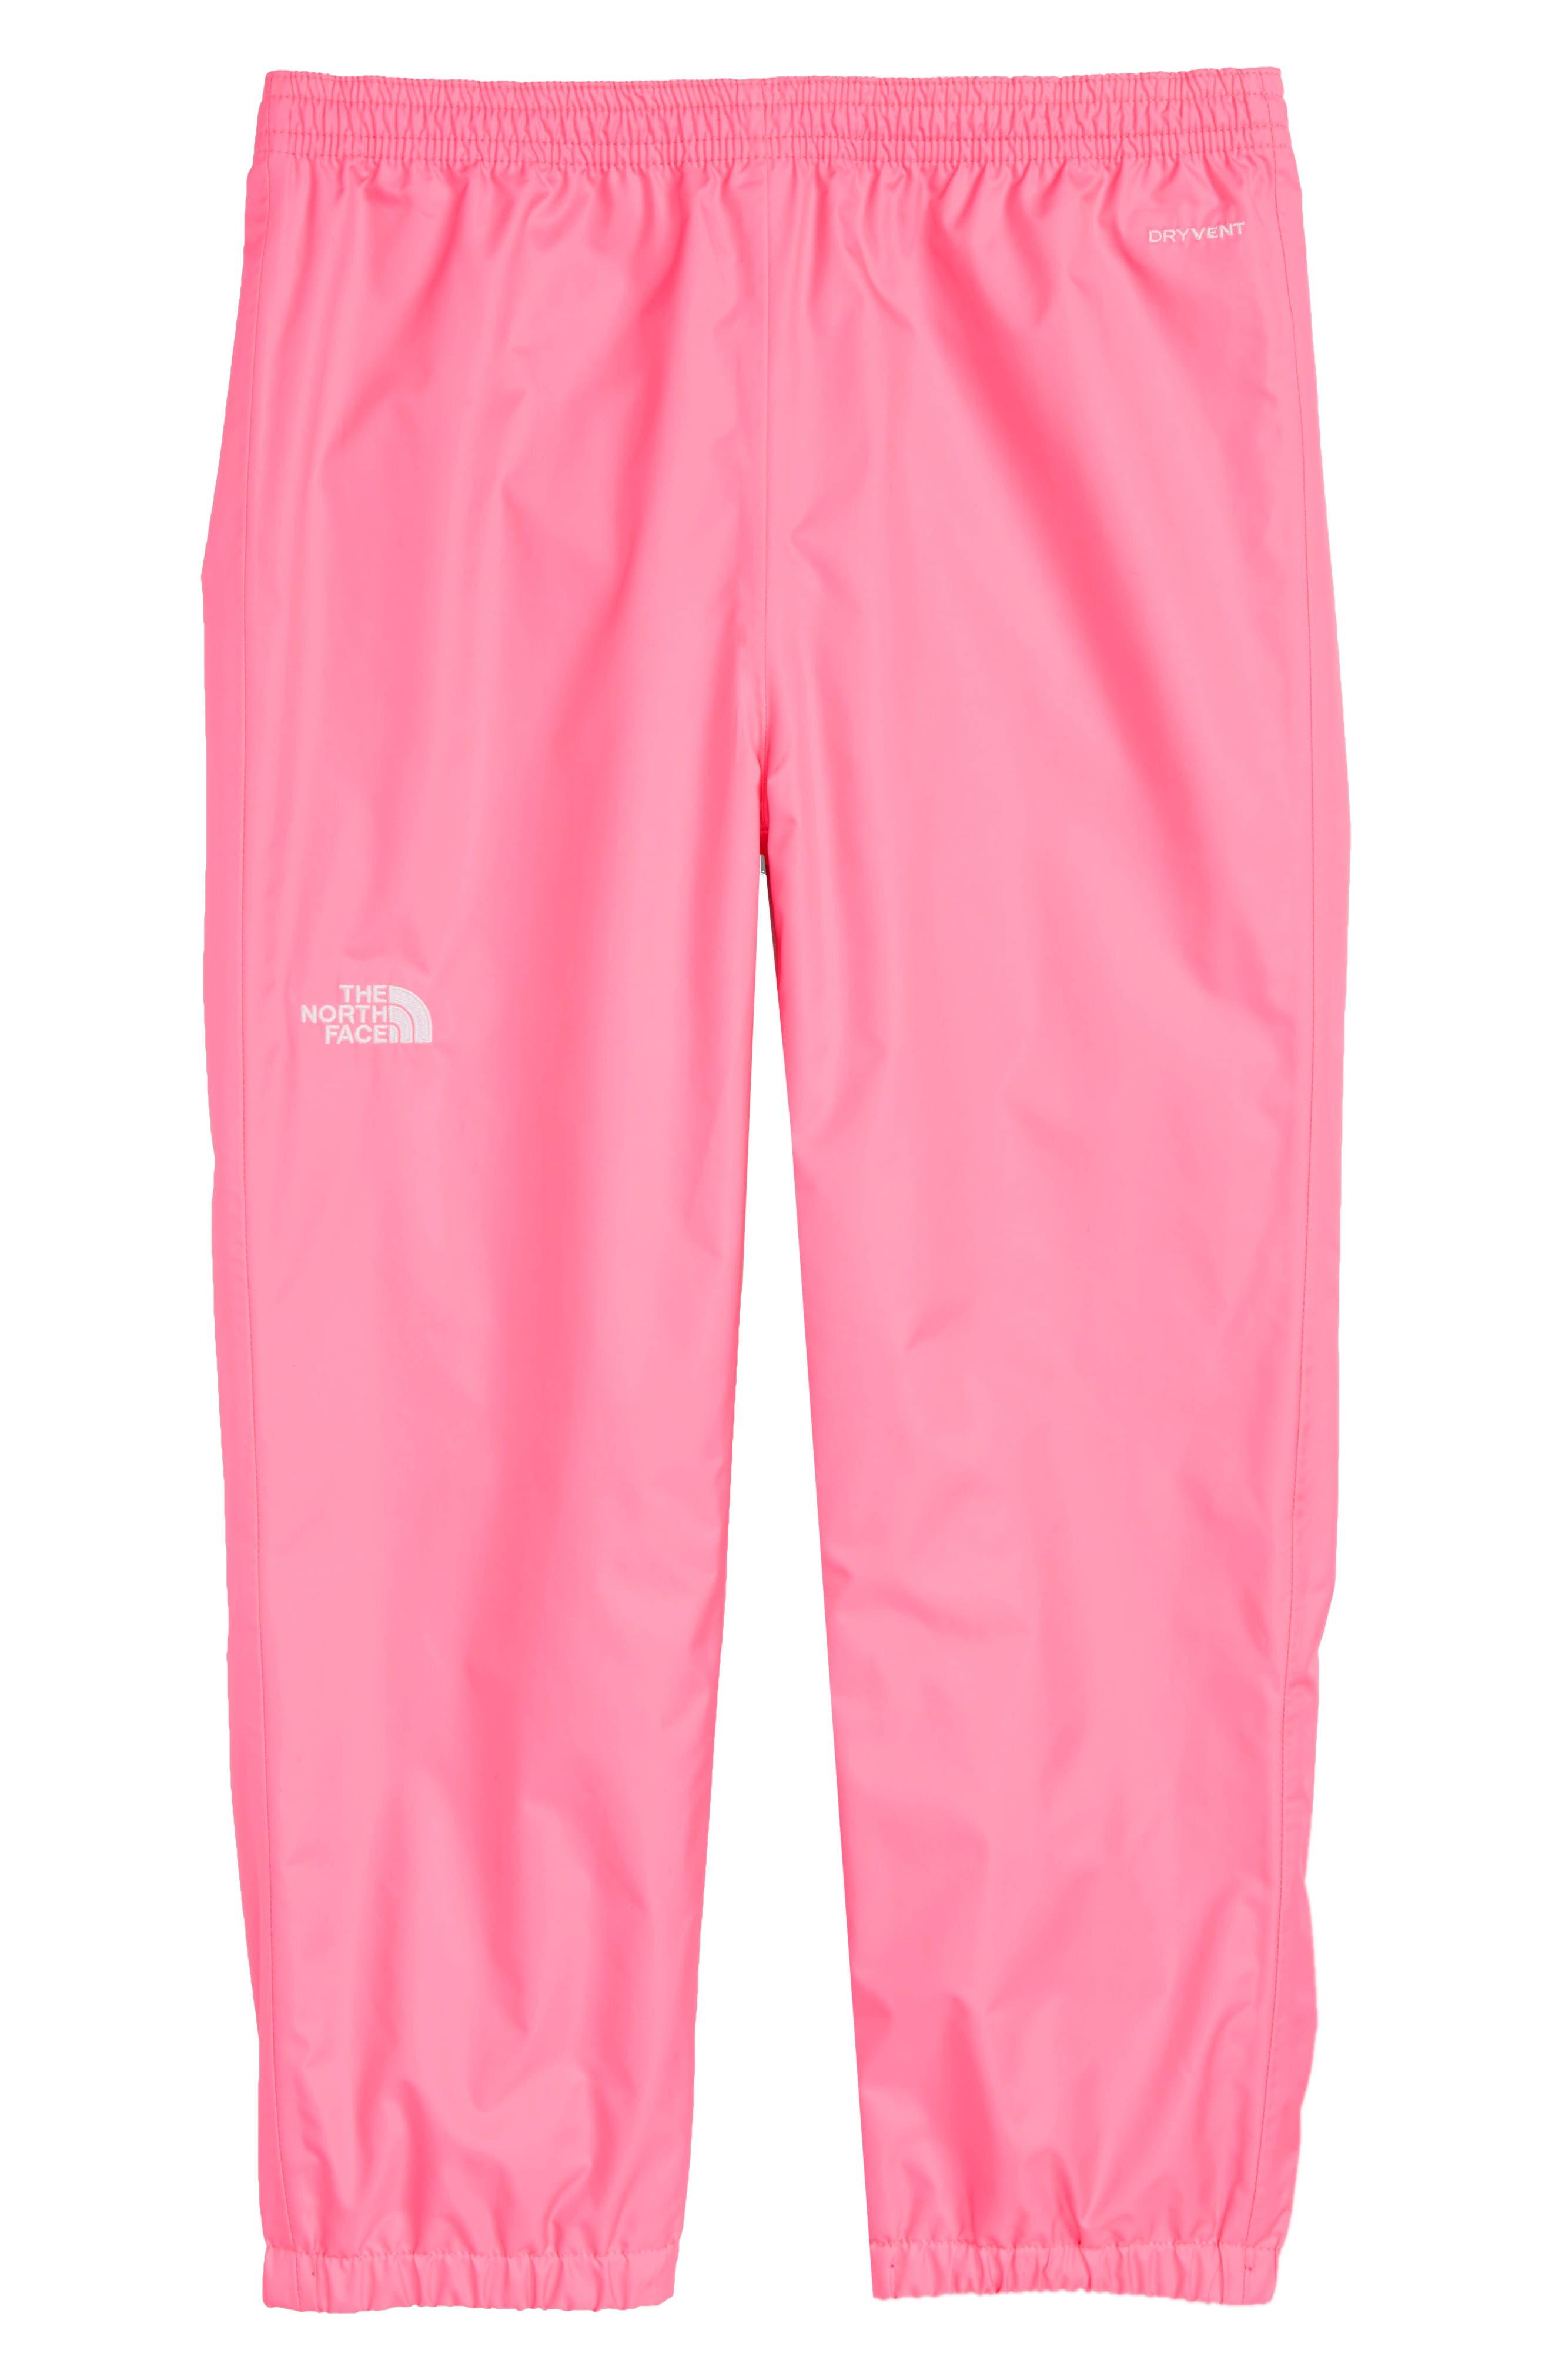 Tailout Waterproof Pants,                             Main thumbnail 1, color,                             Gem Pink